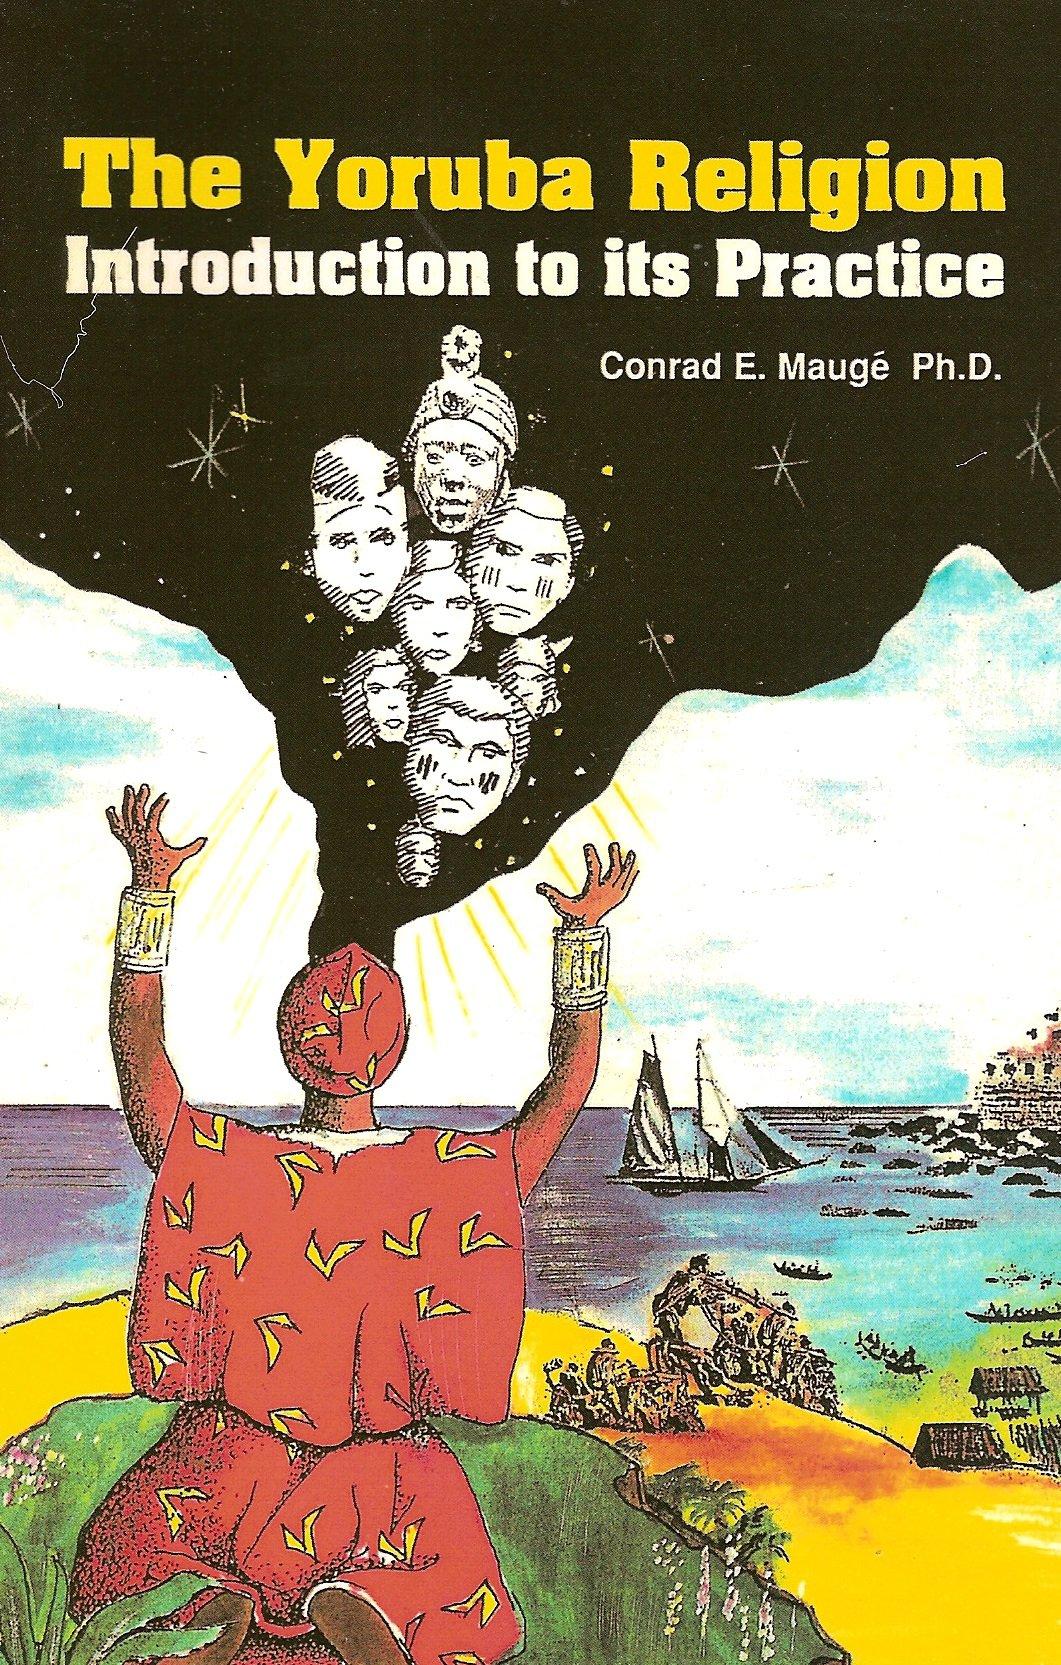 The Yoruba Religion: Introduction to its Practice: Conrad E. Mauge:  9780942272970: Amazon.com: Books